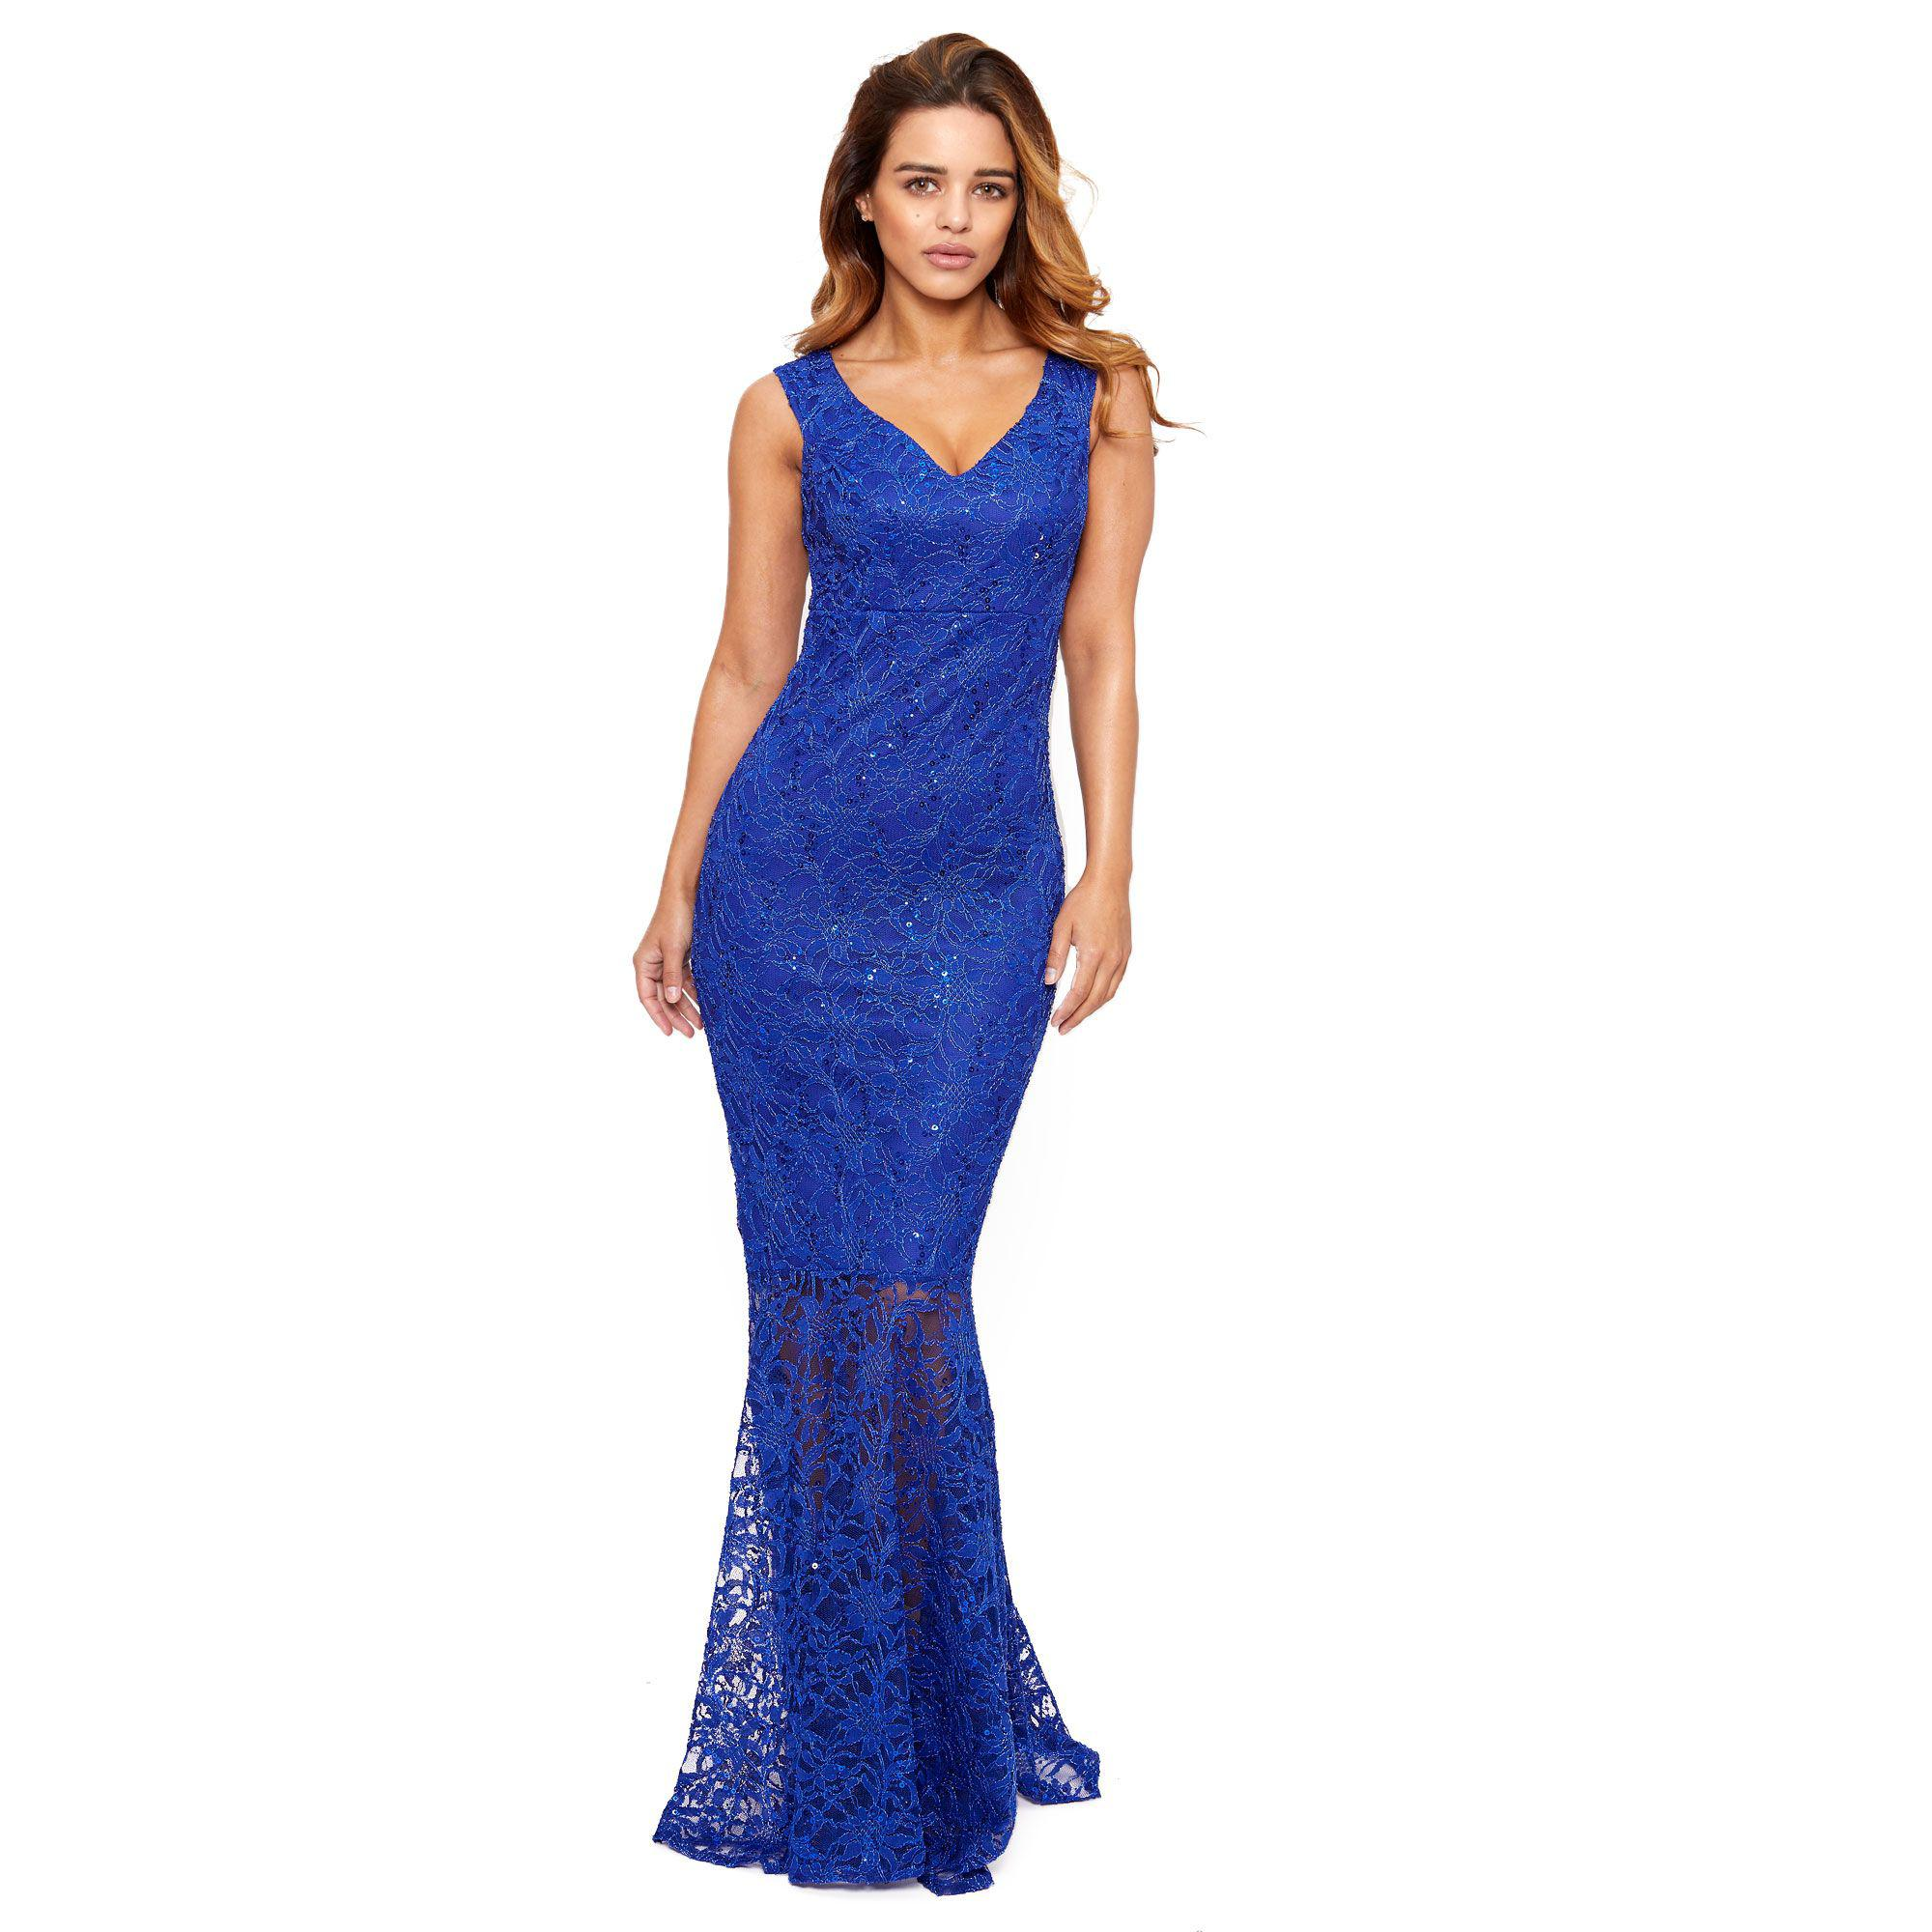 e244b593 Lipstick Boutique Cobalt 'lulia' Bardot Sequin Lace Maxi Dress With ...